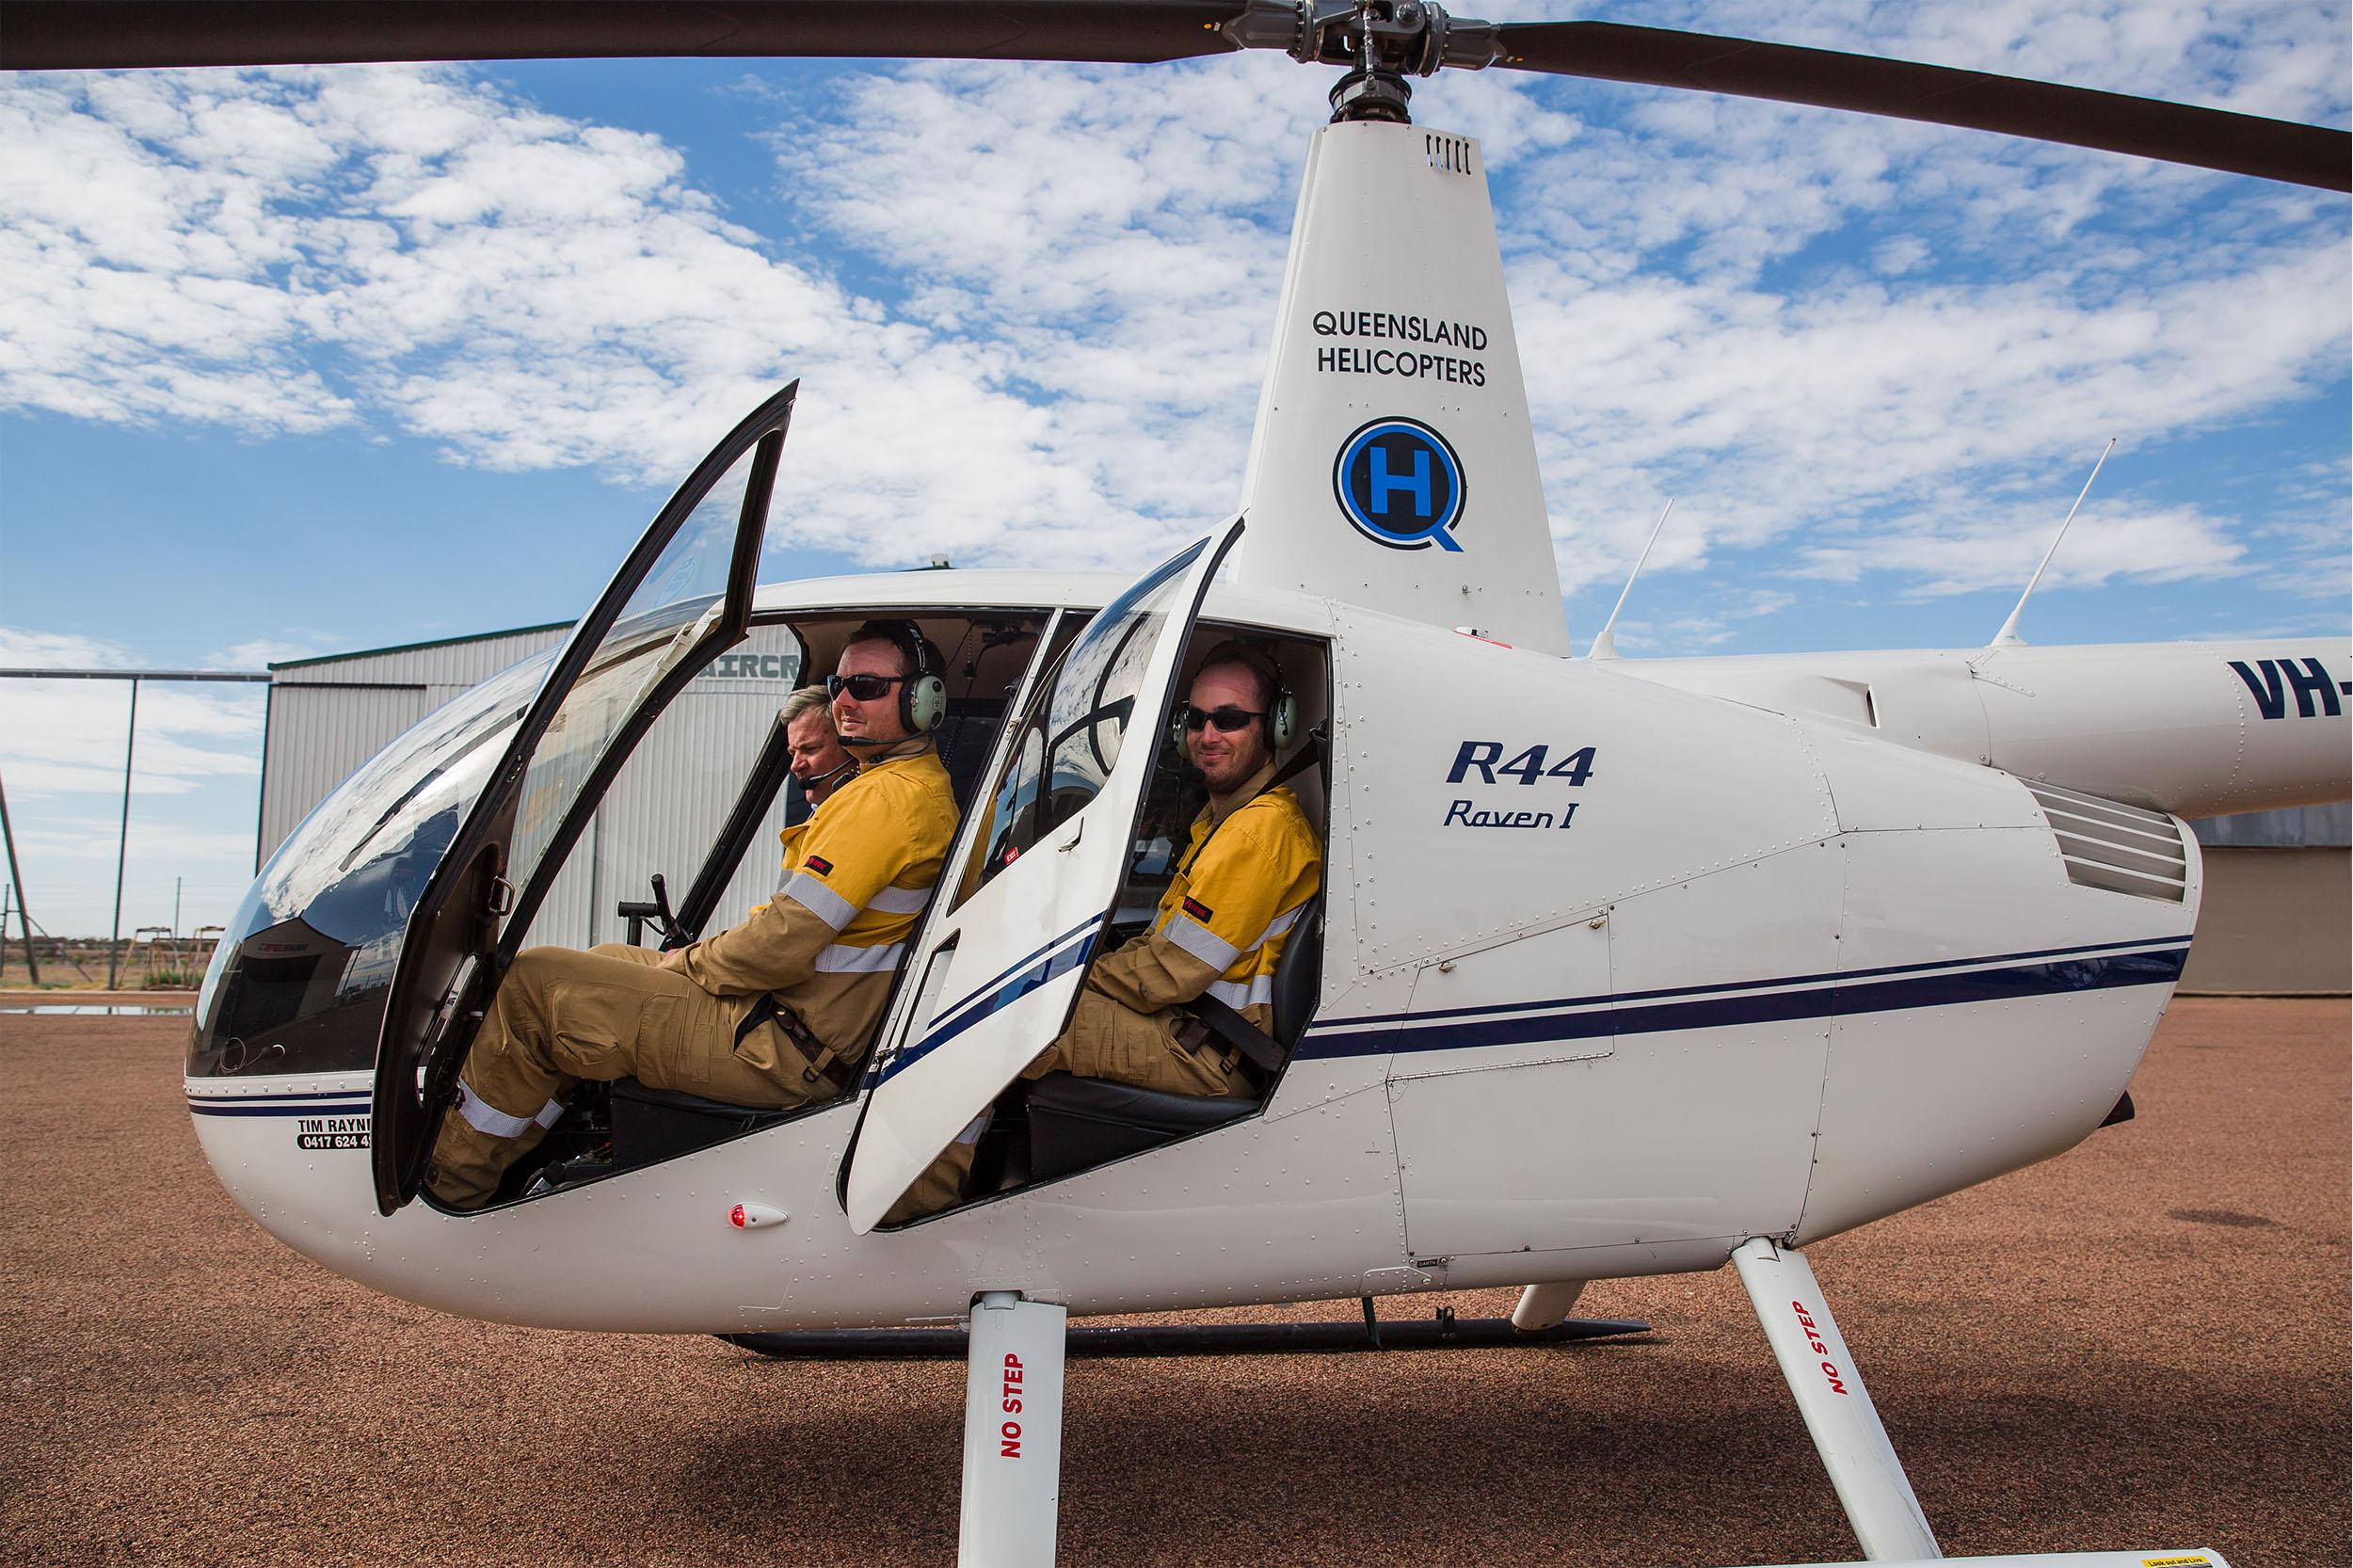 Queensland Helicopters - testimonials - workers